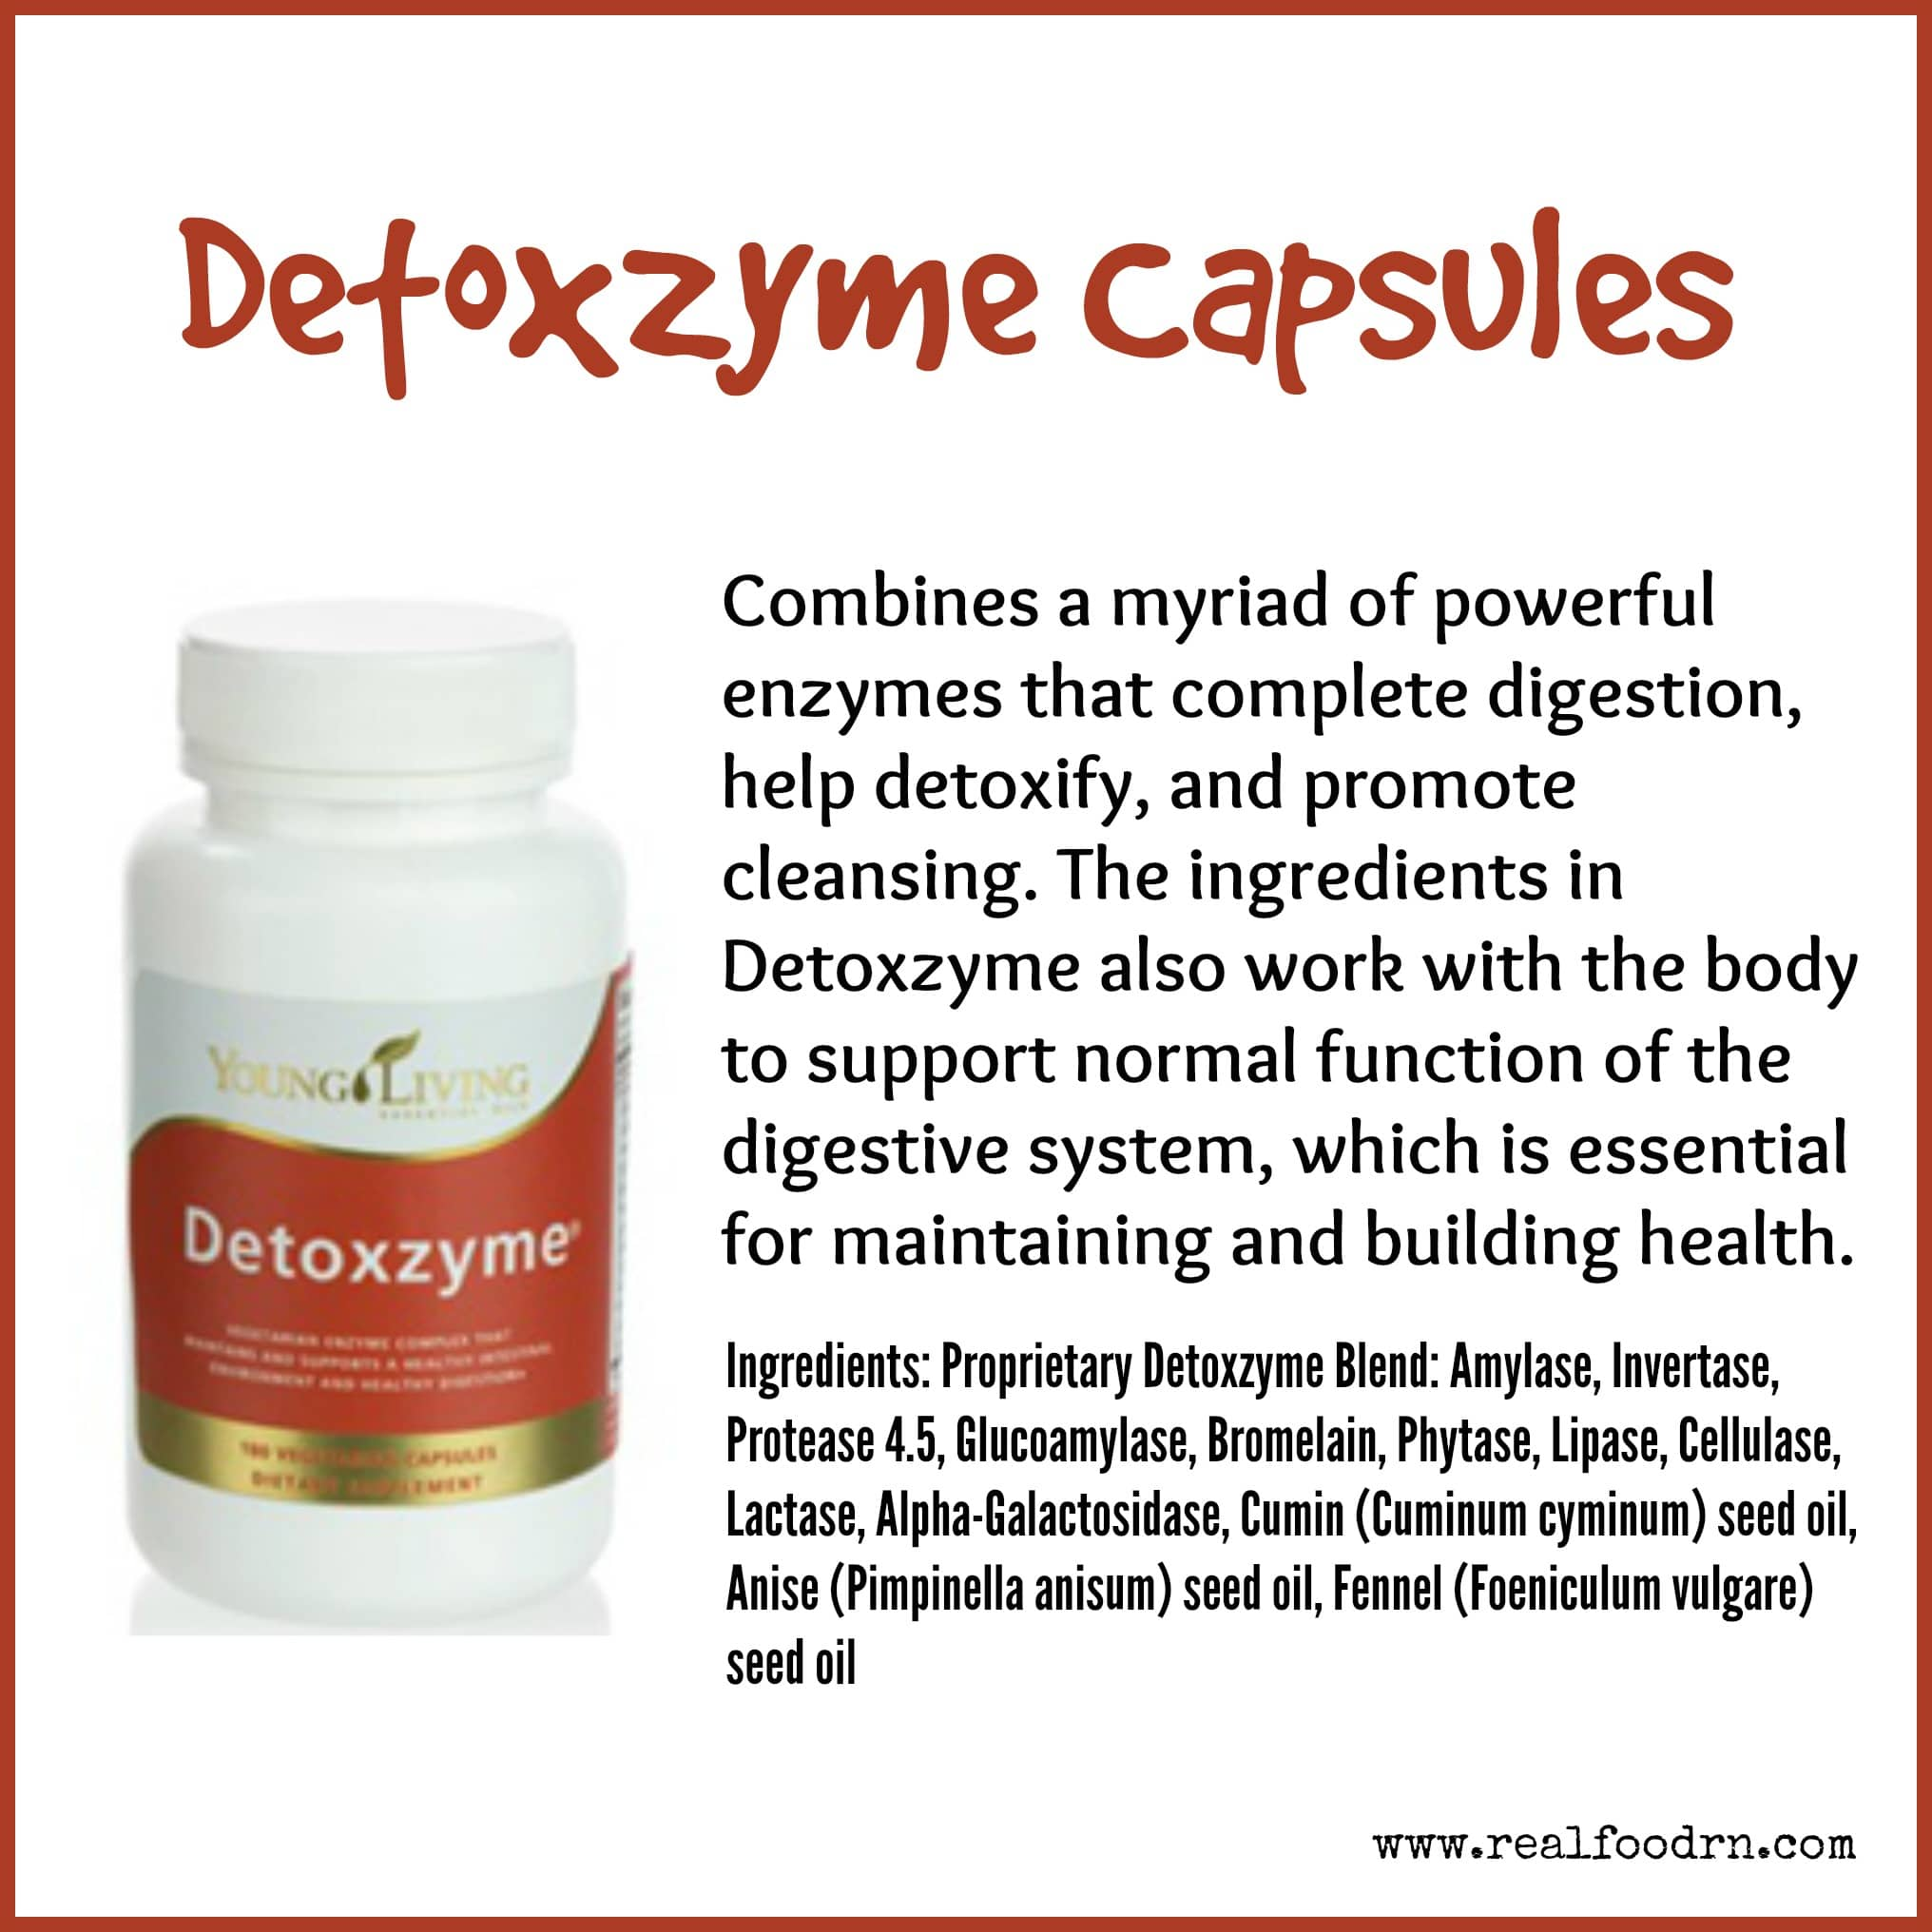 Detoxzyme Capsules